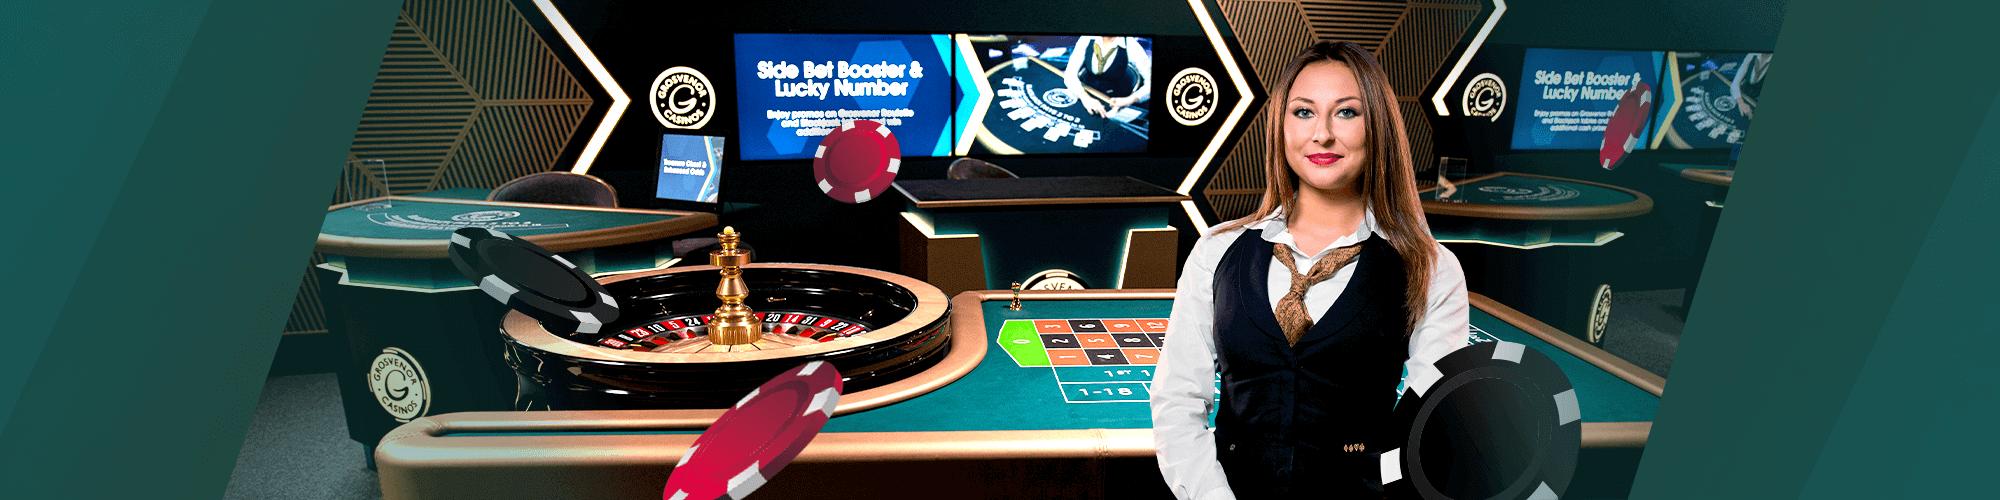 Casino Live Lobby